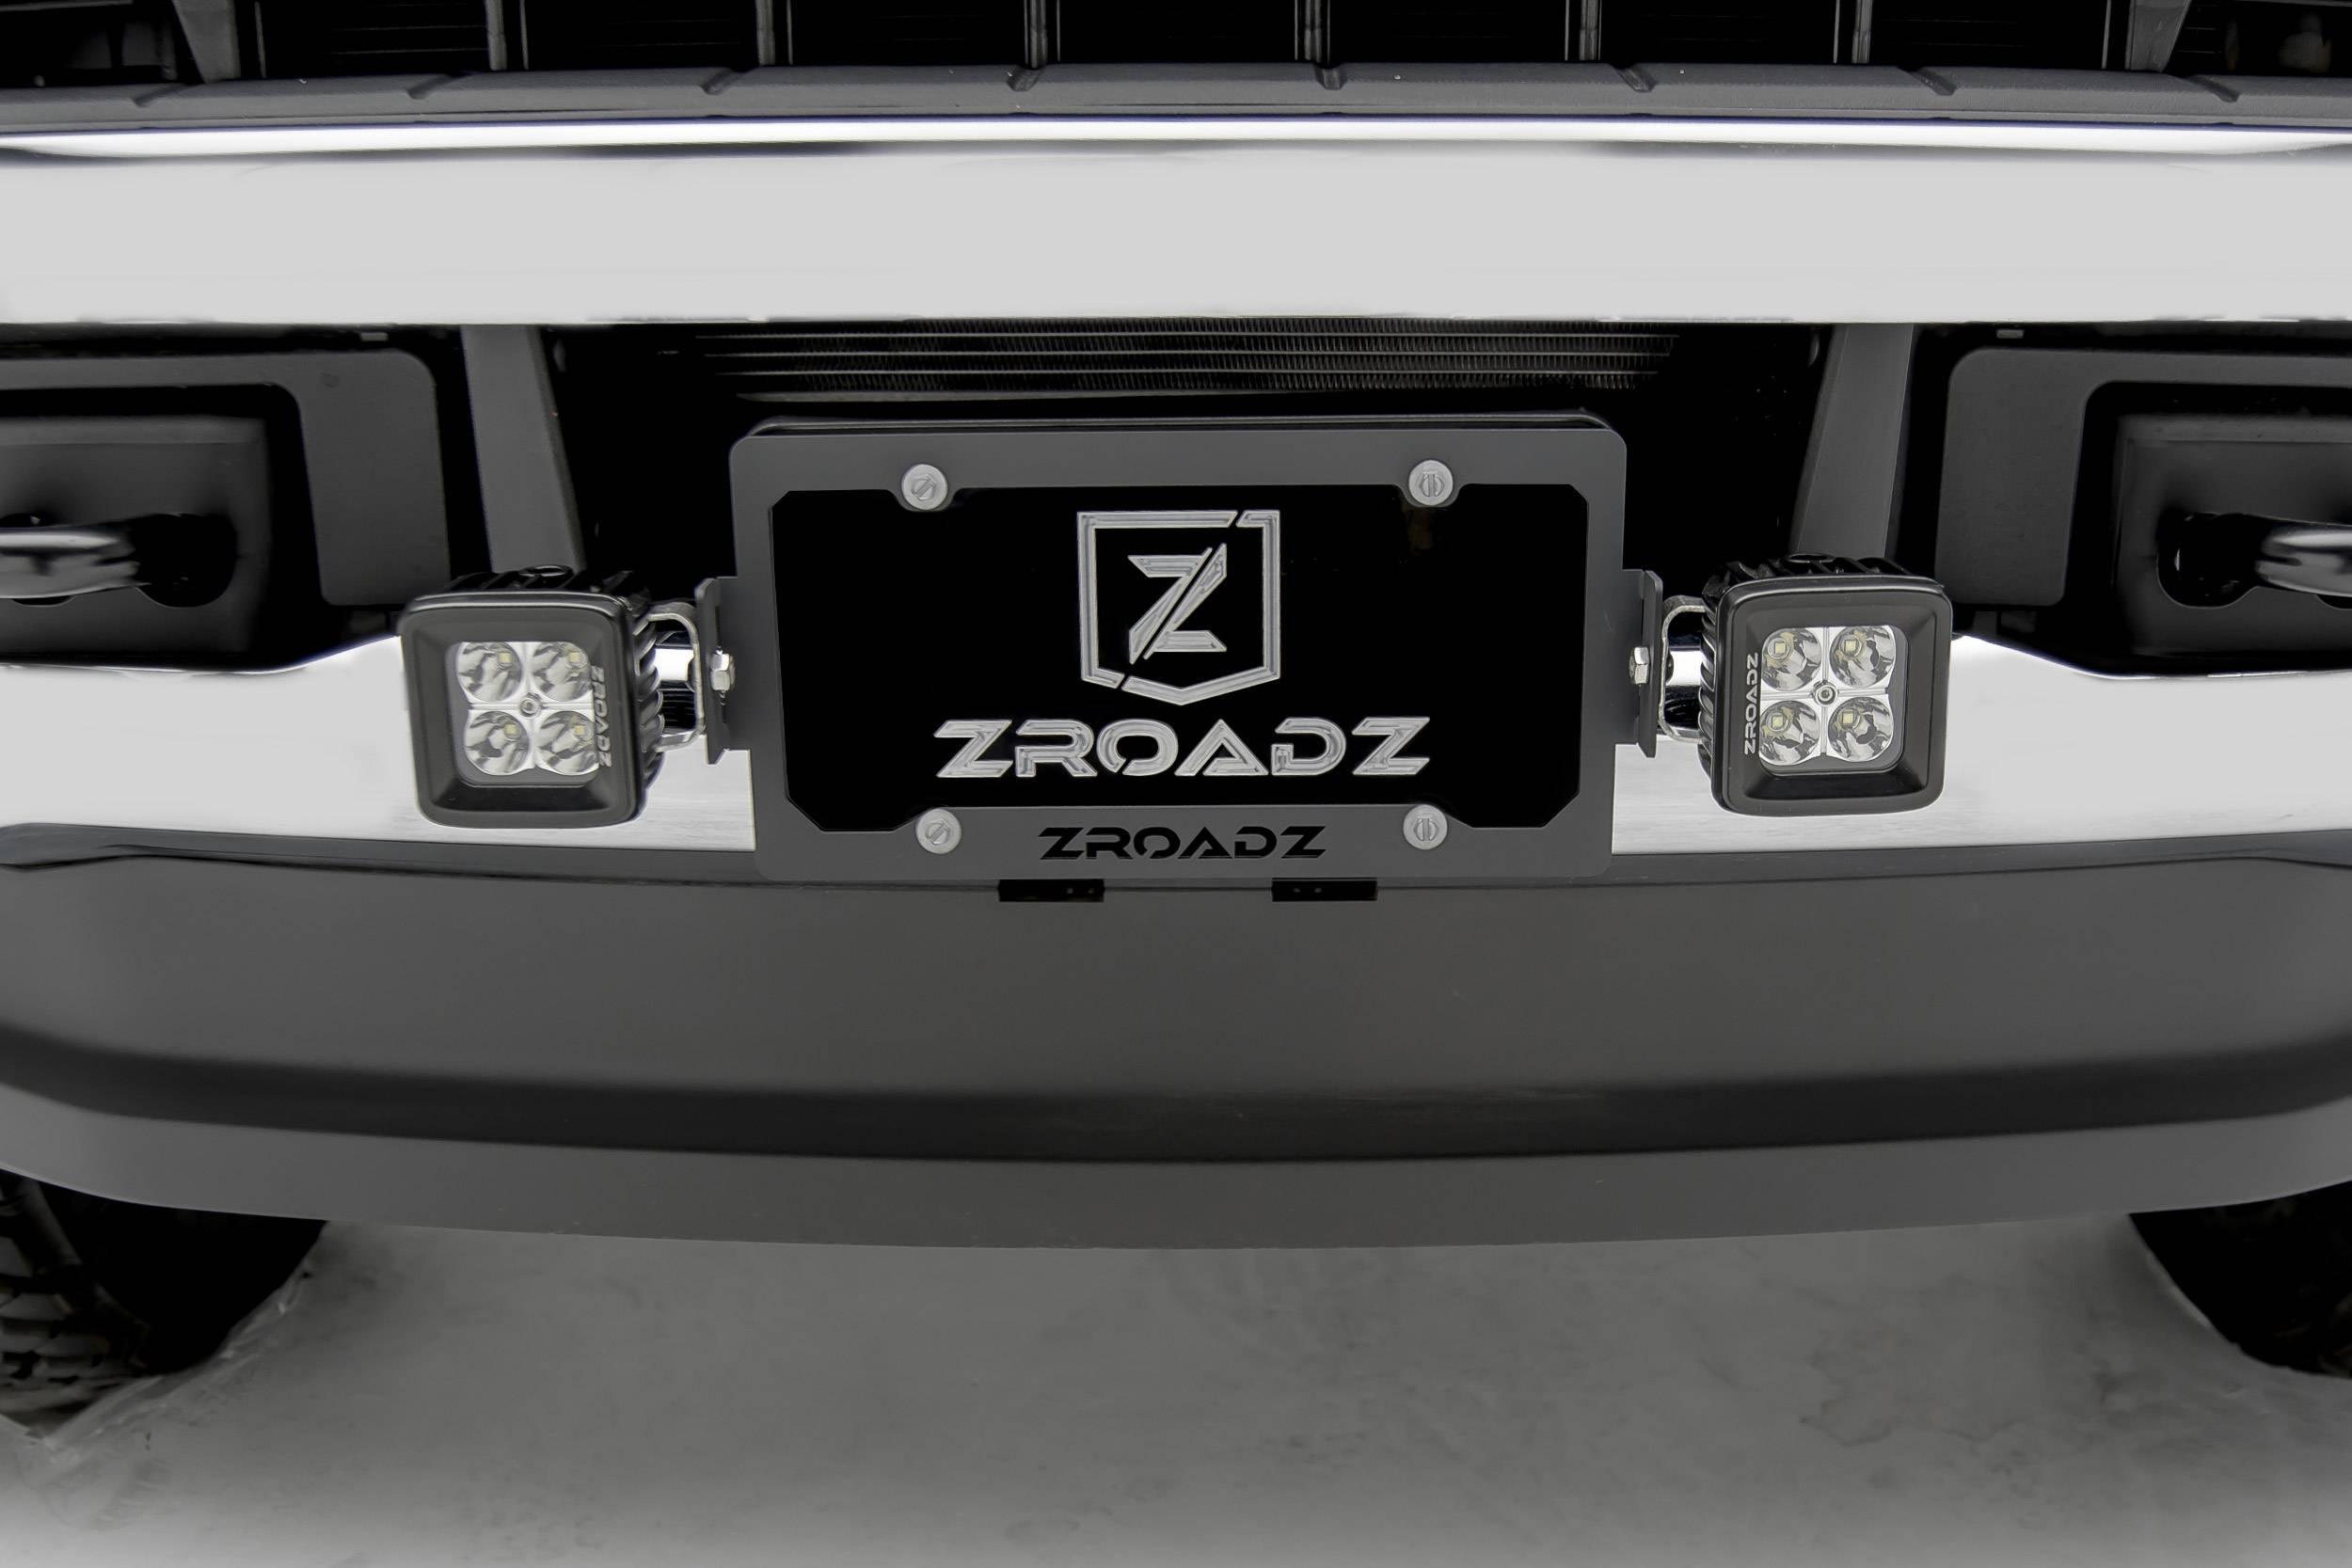 ZROADZ                                             - Universal License Plate Frame LED Bracket to mount (2) 3 Inch LED Pod Lights - PN #Z310005